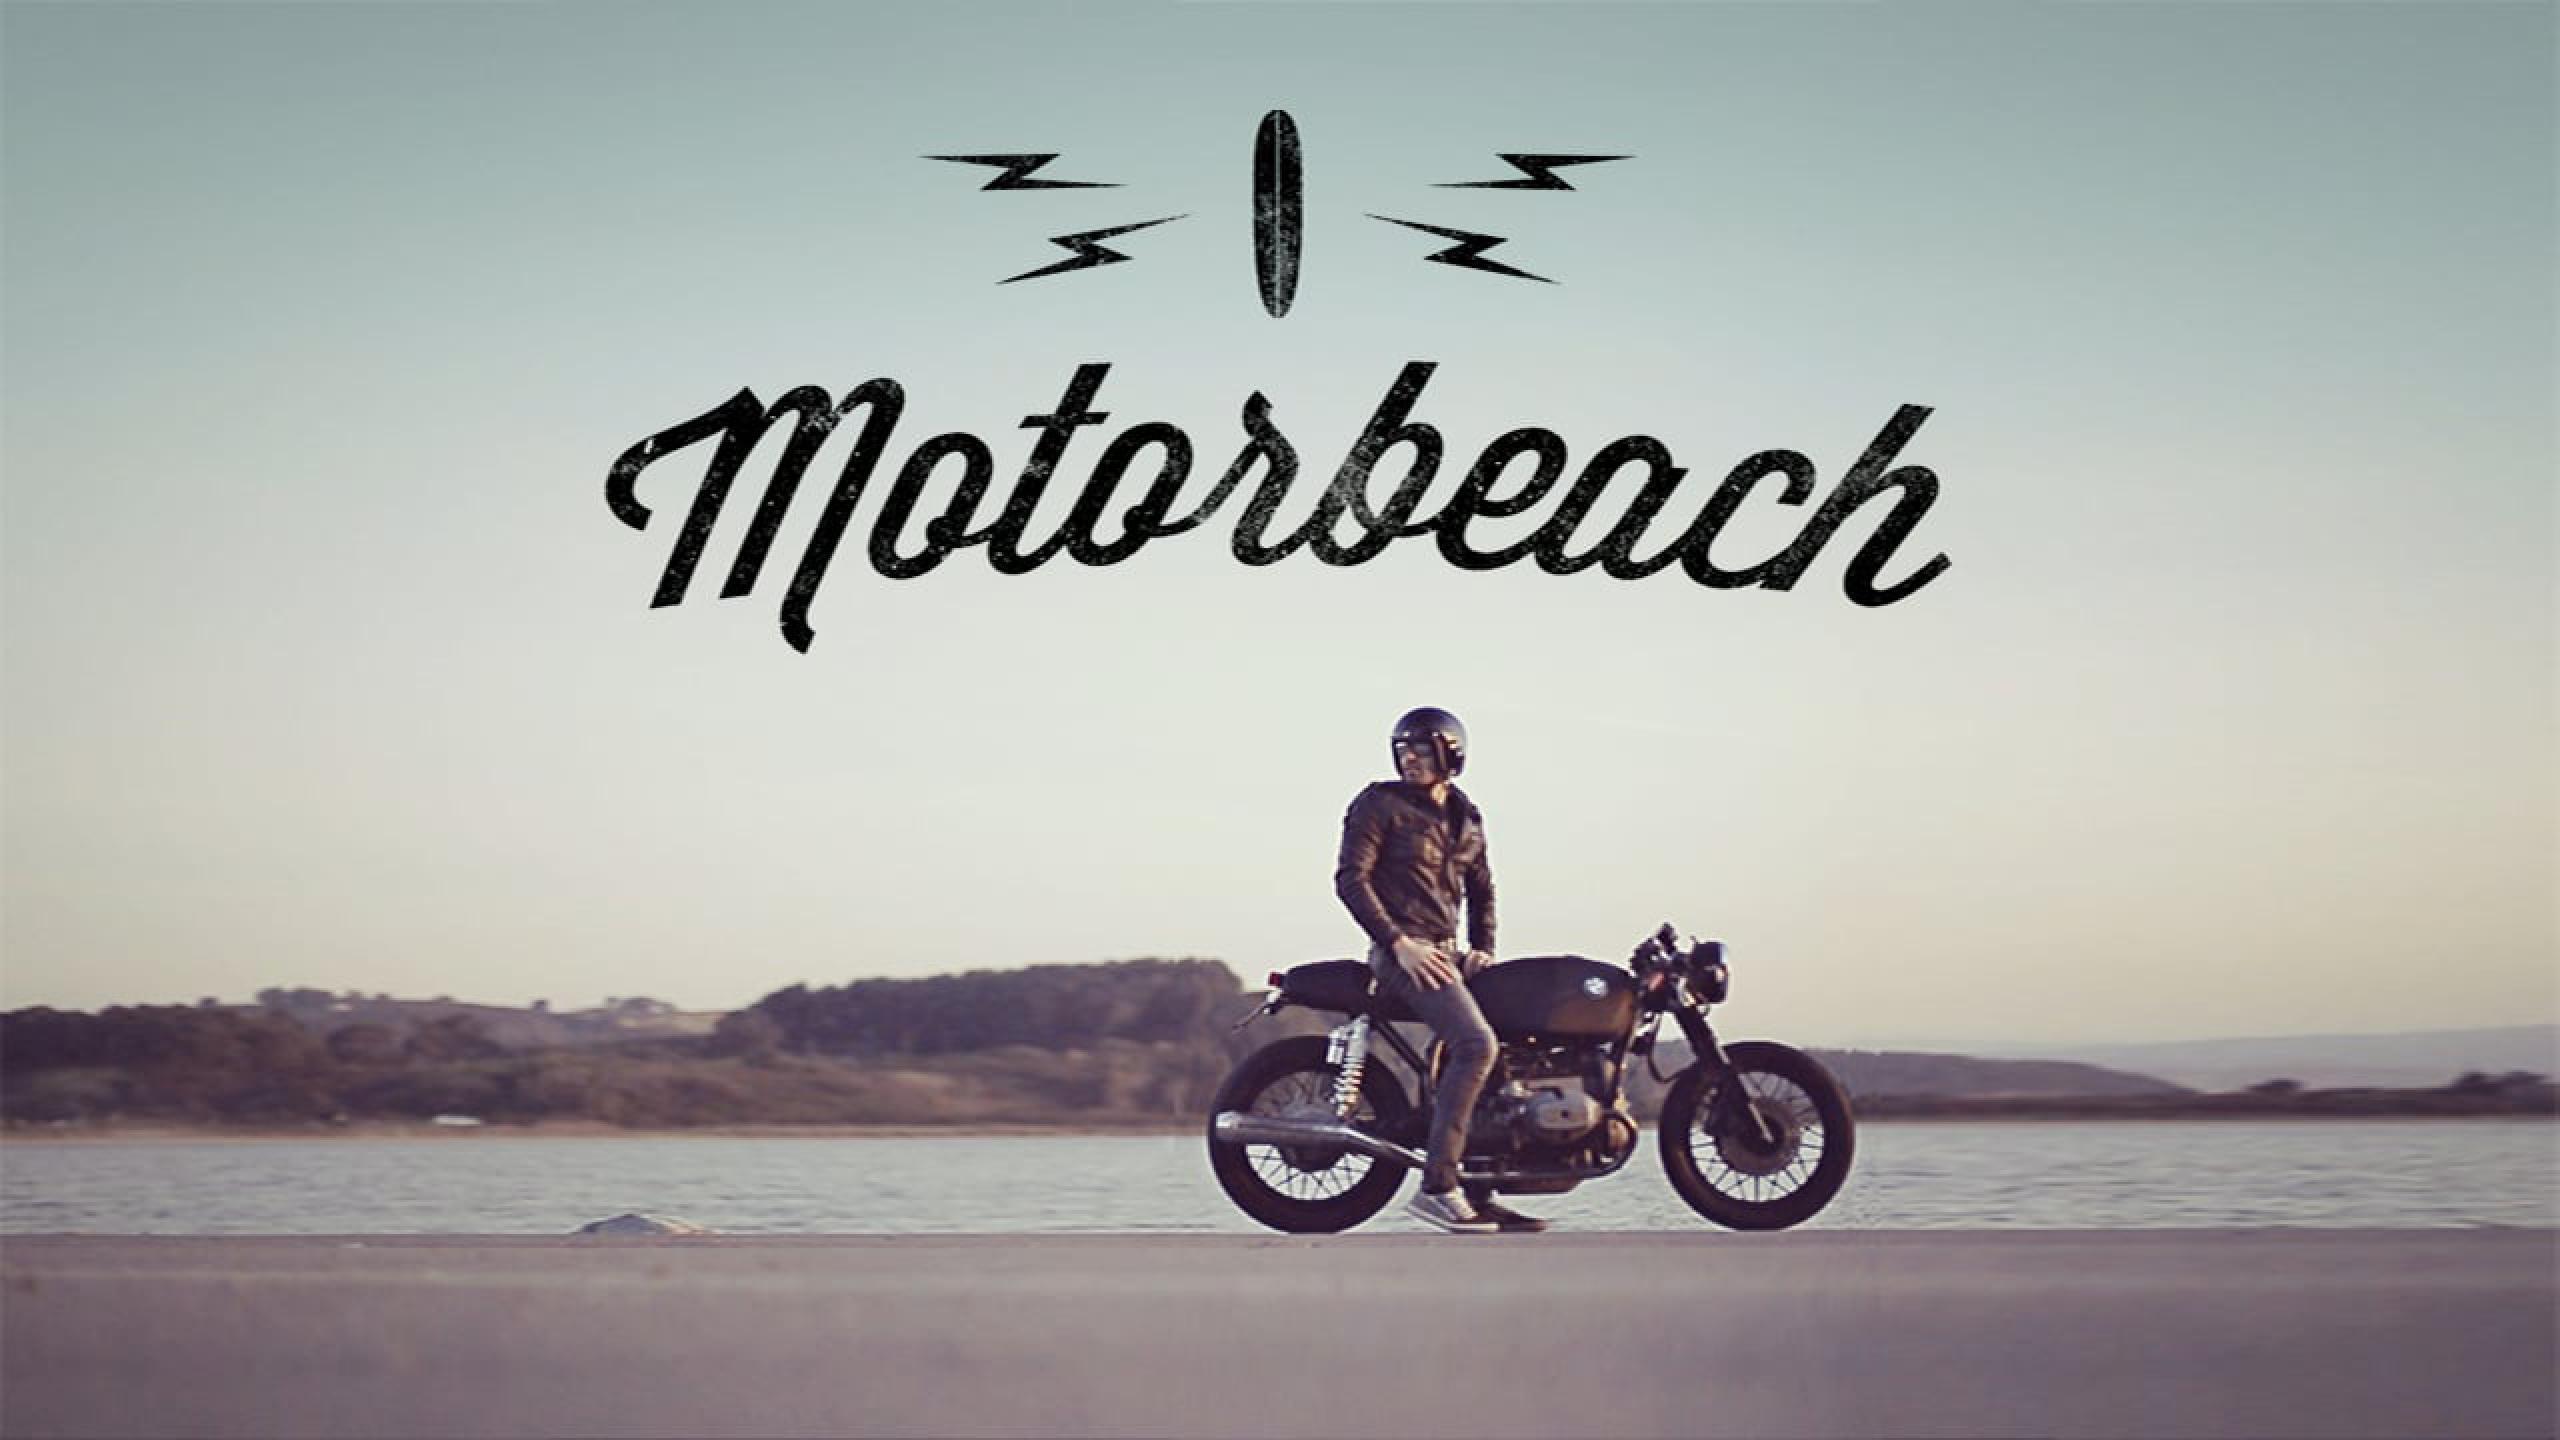 motorbeach festival, evento motero, festival motero, motos & surf, cafe racer, evento cafe racer, coches clásicos